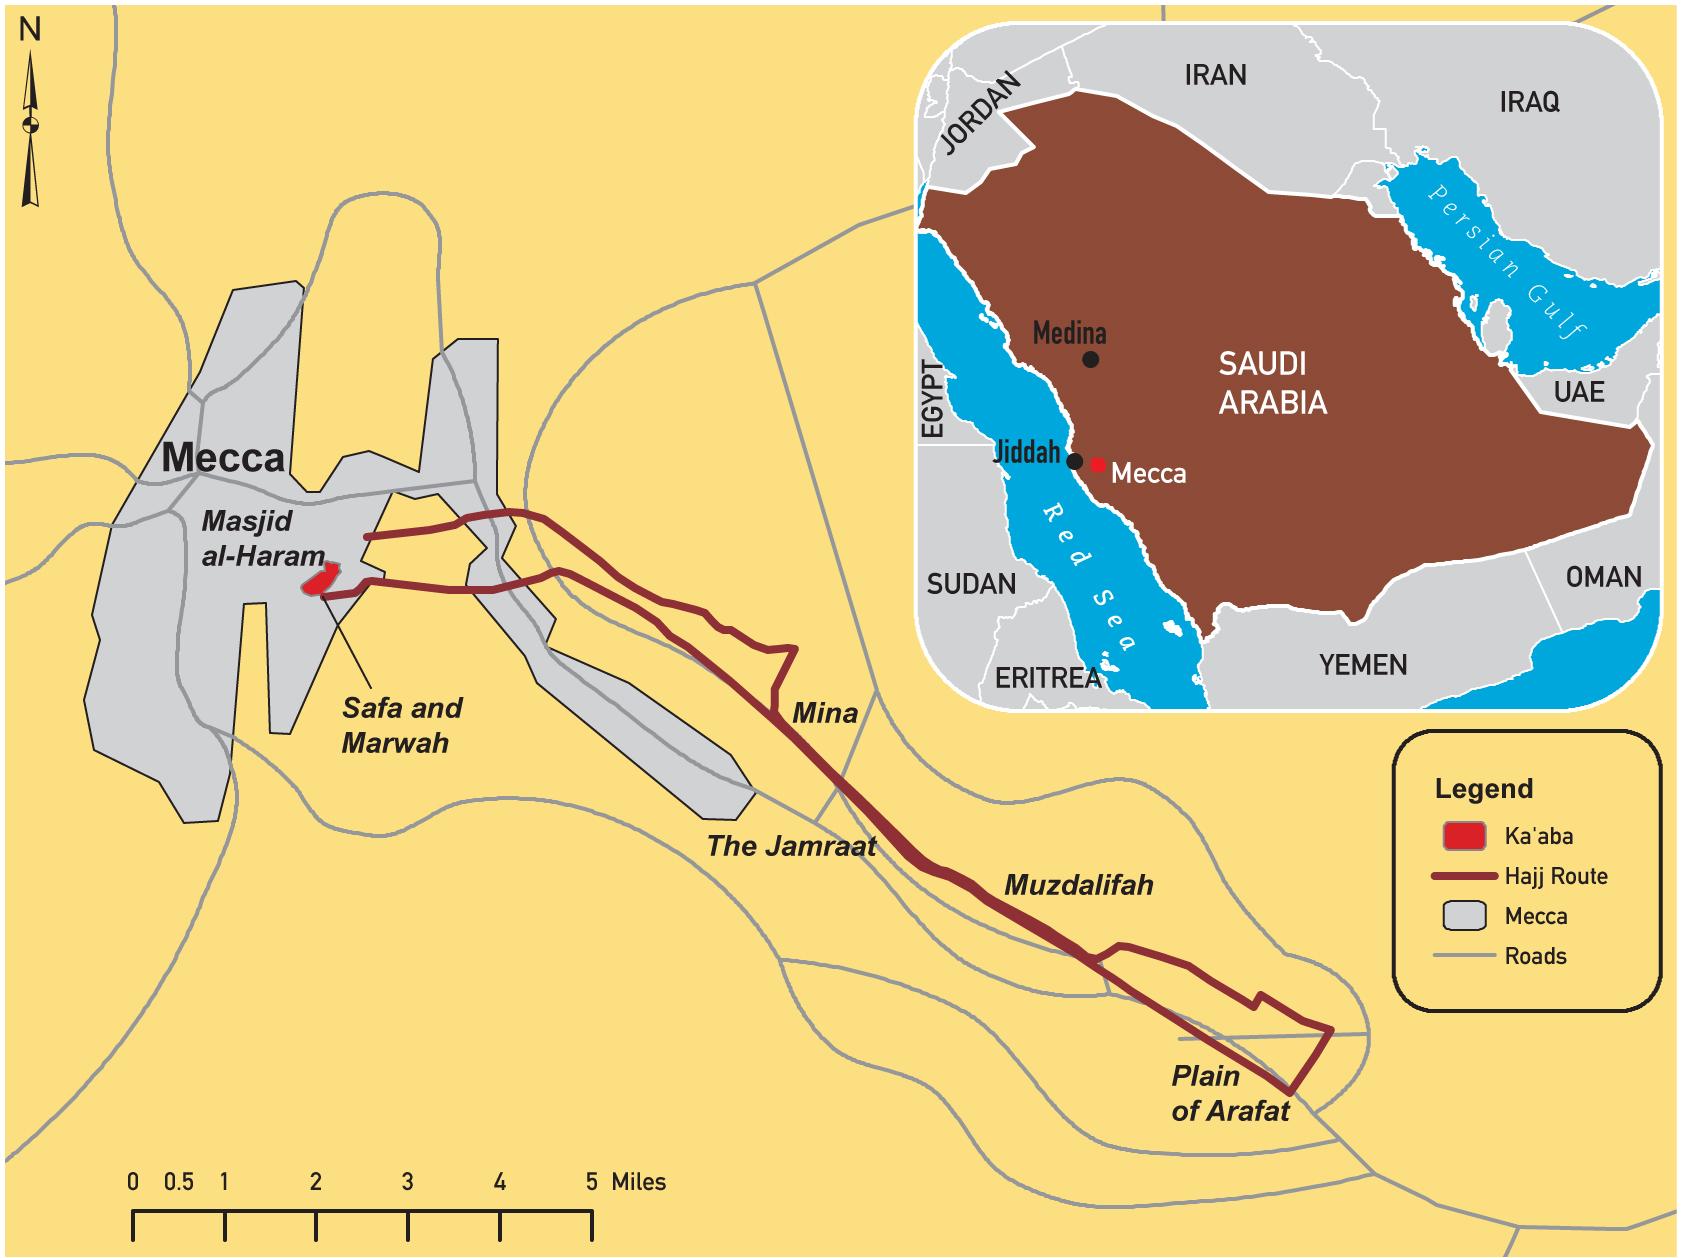 of Saudi Arabia 2011